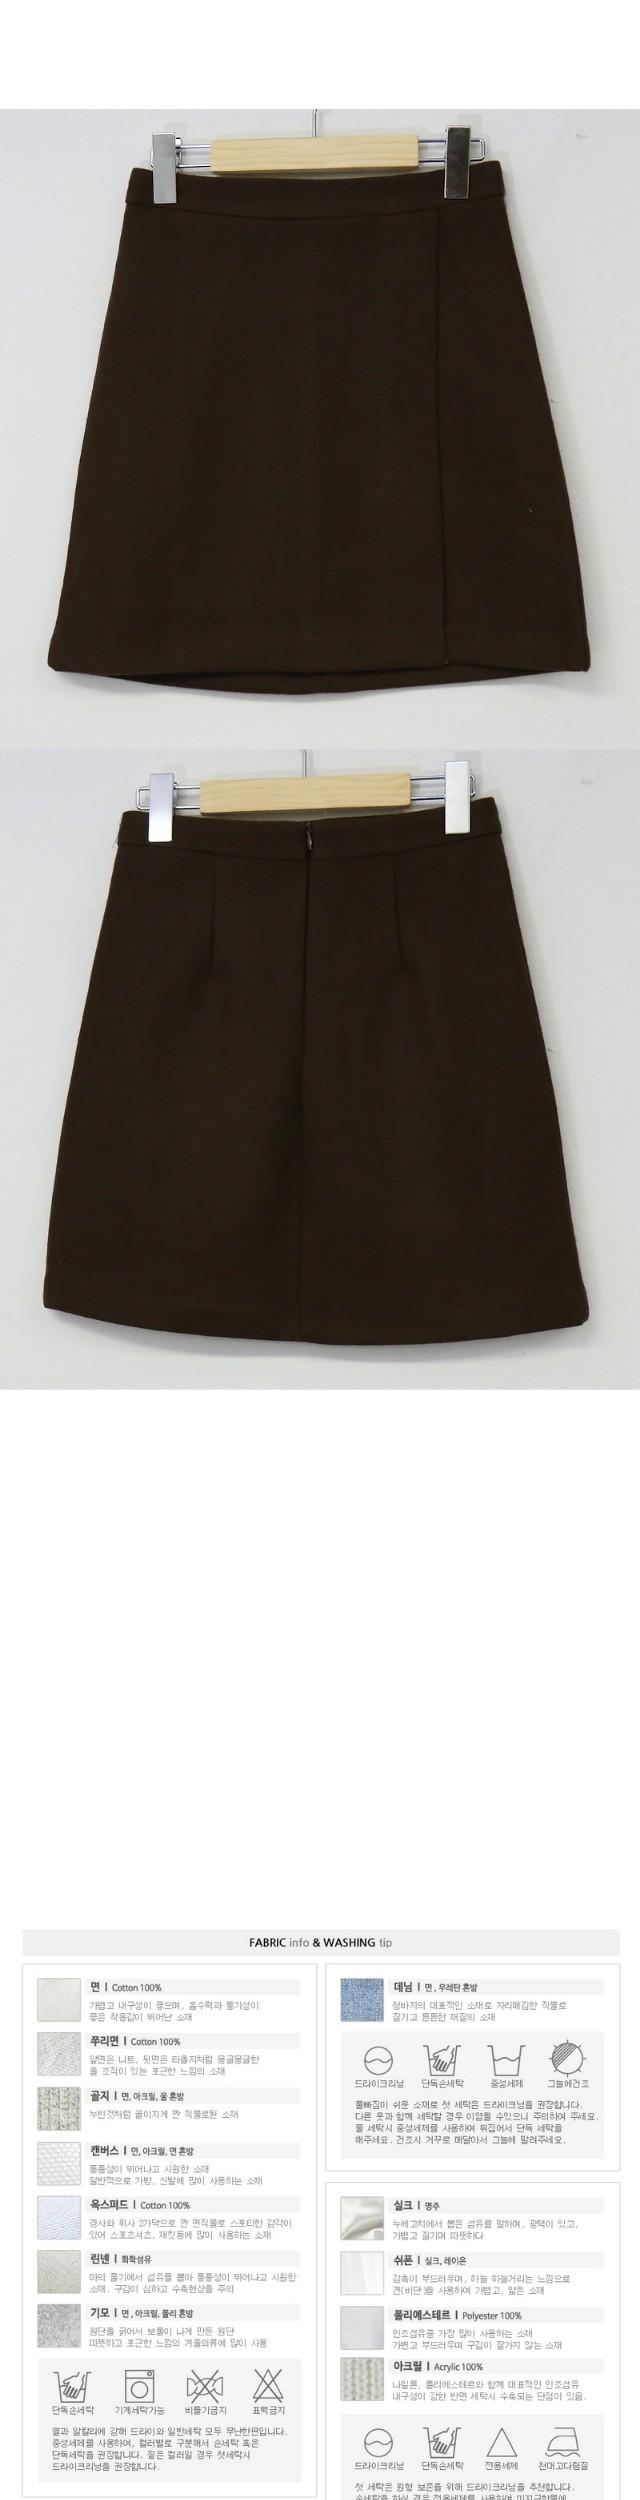 Wool lap skirt